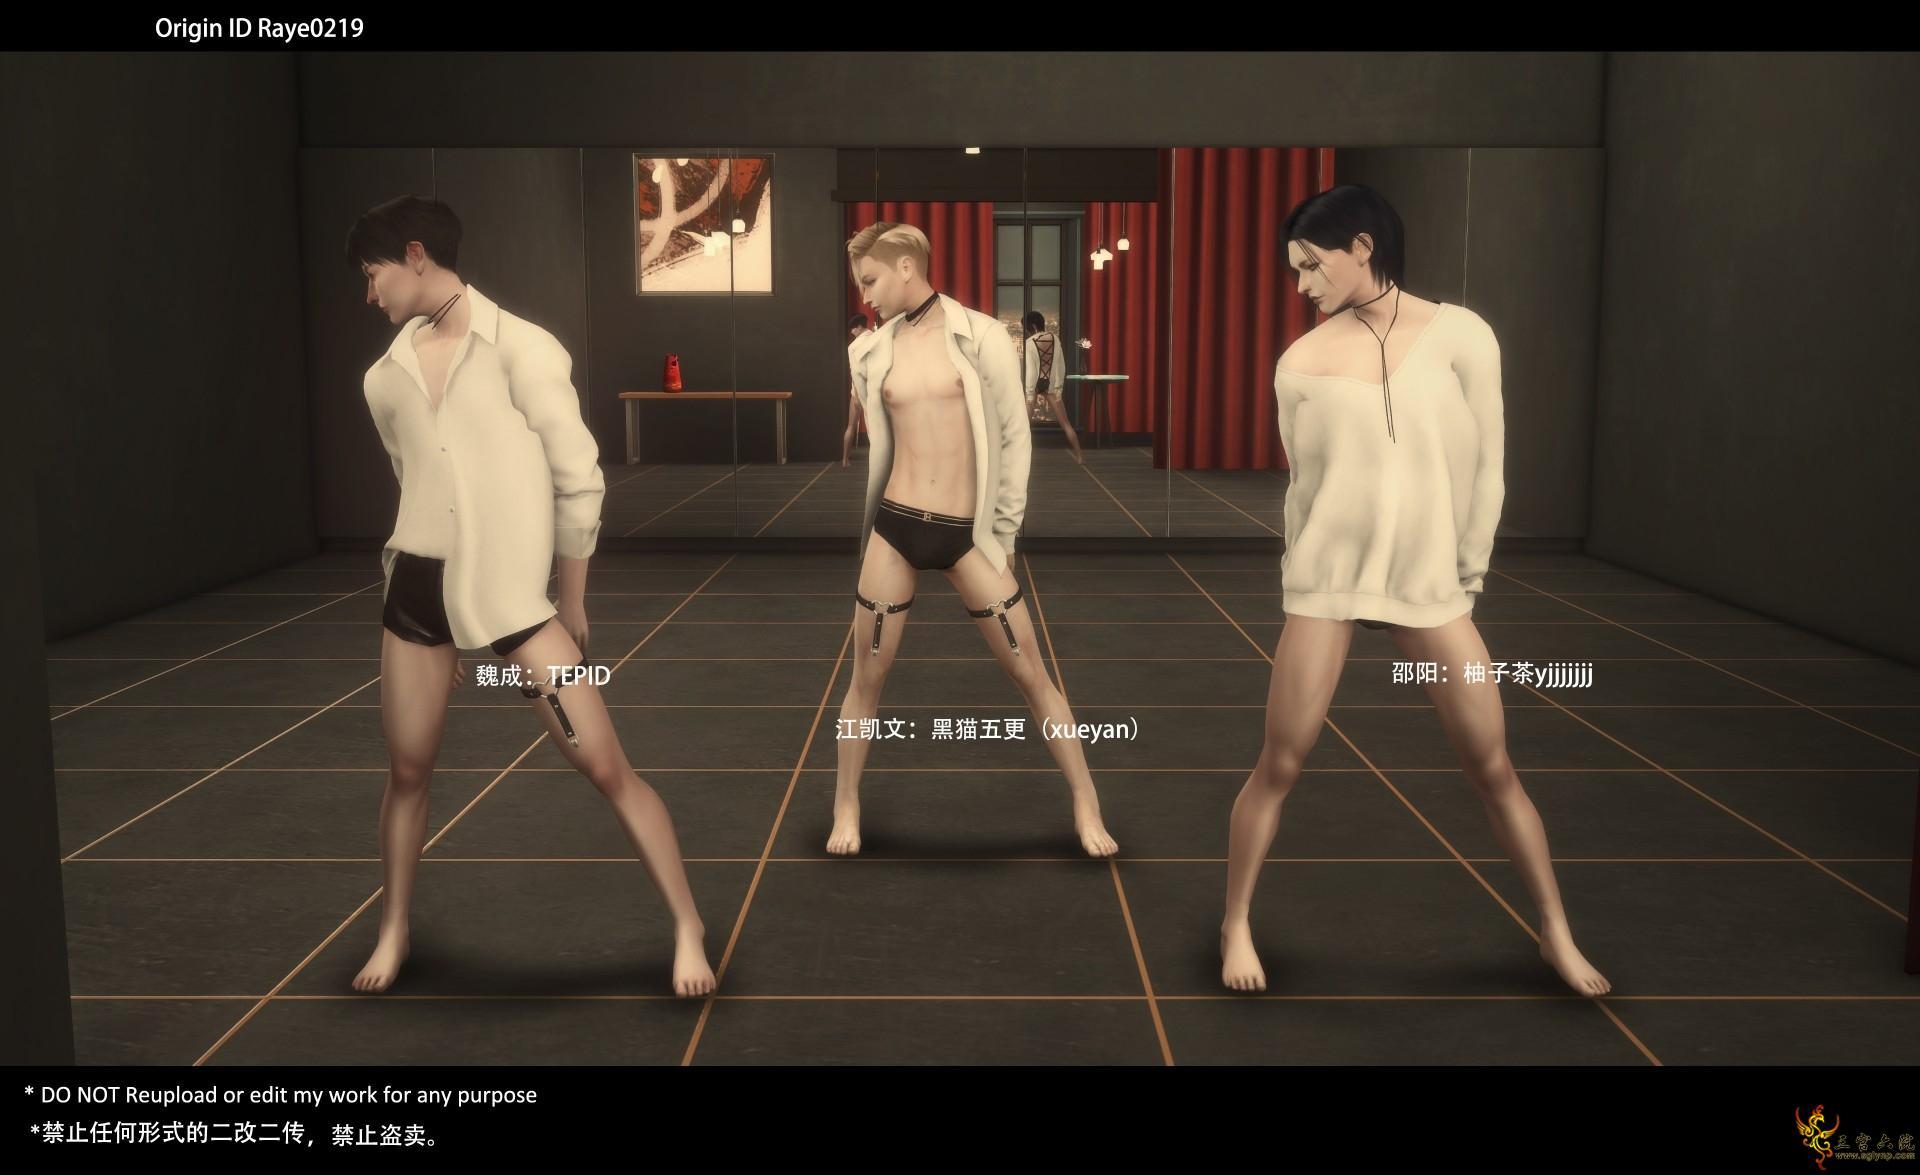 【R219】MMD Dance Pose Conqueror 07 .jpg